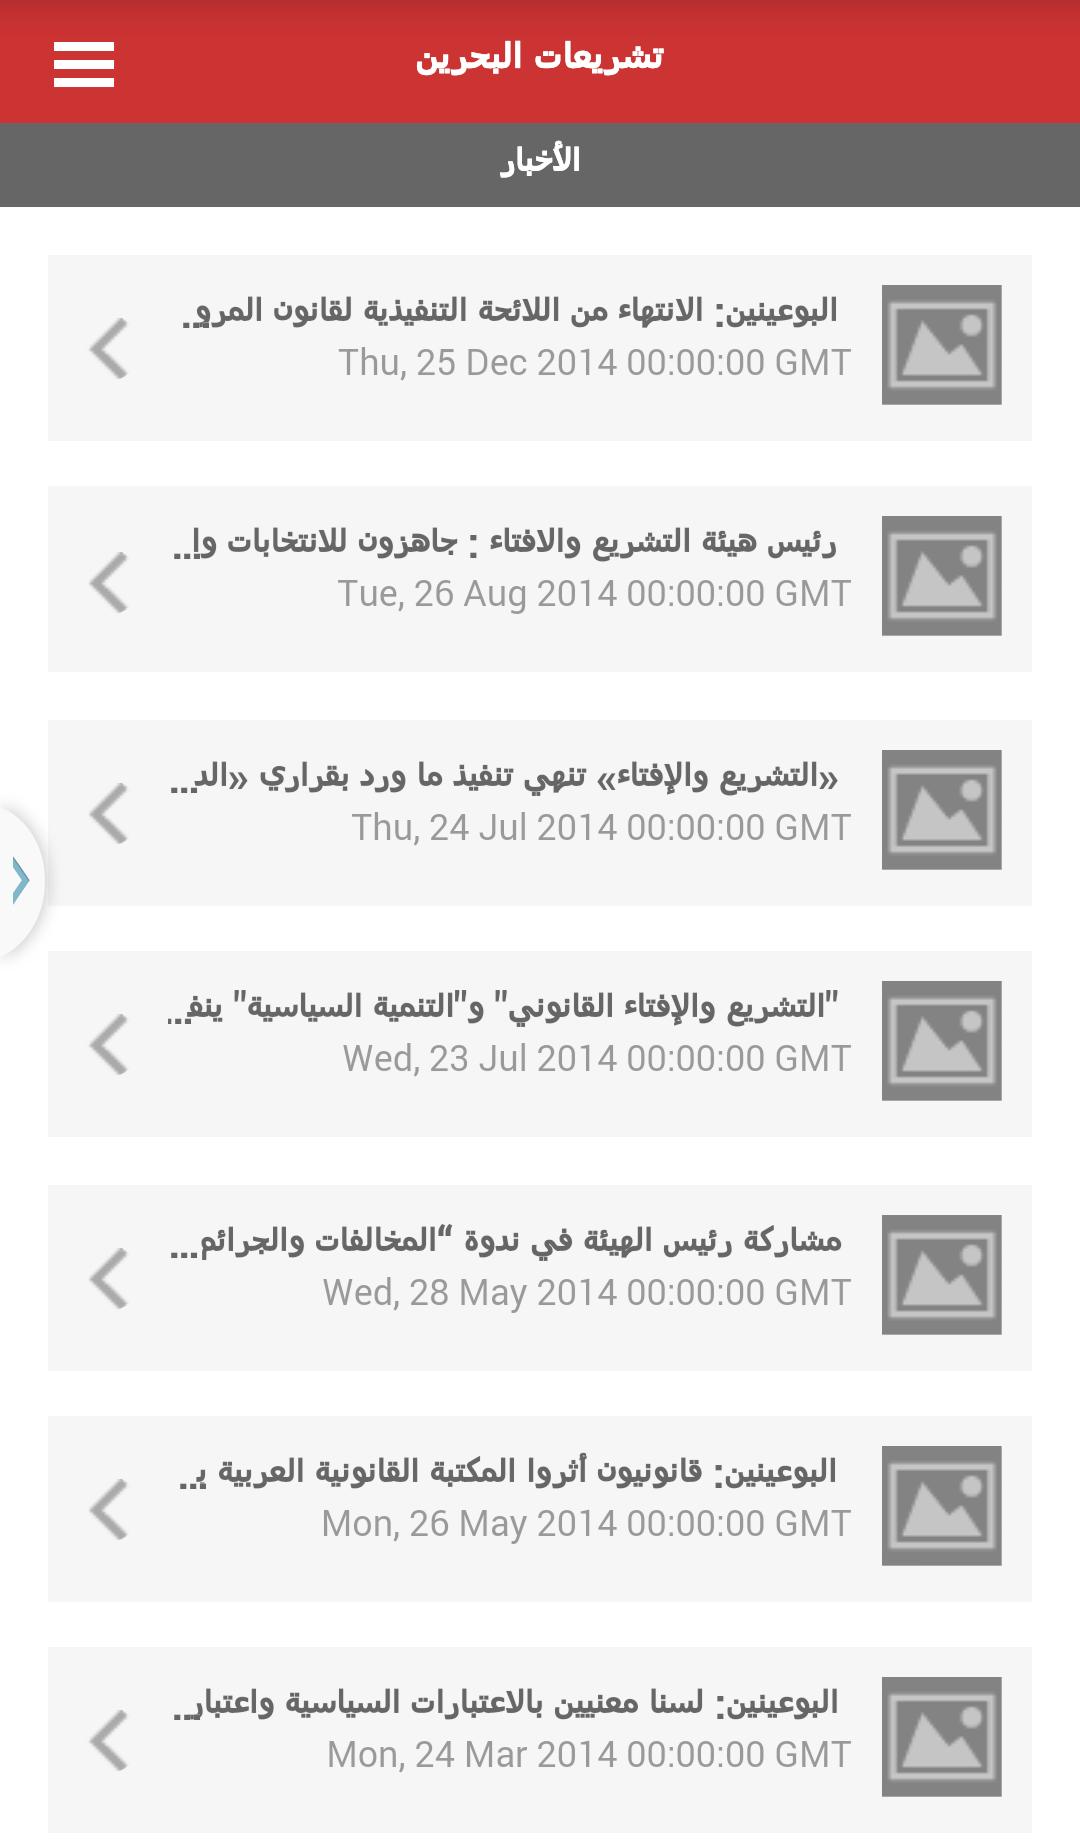 Legislation of Bahrain Screenshot